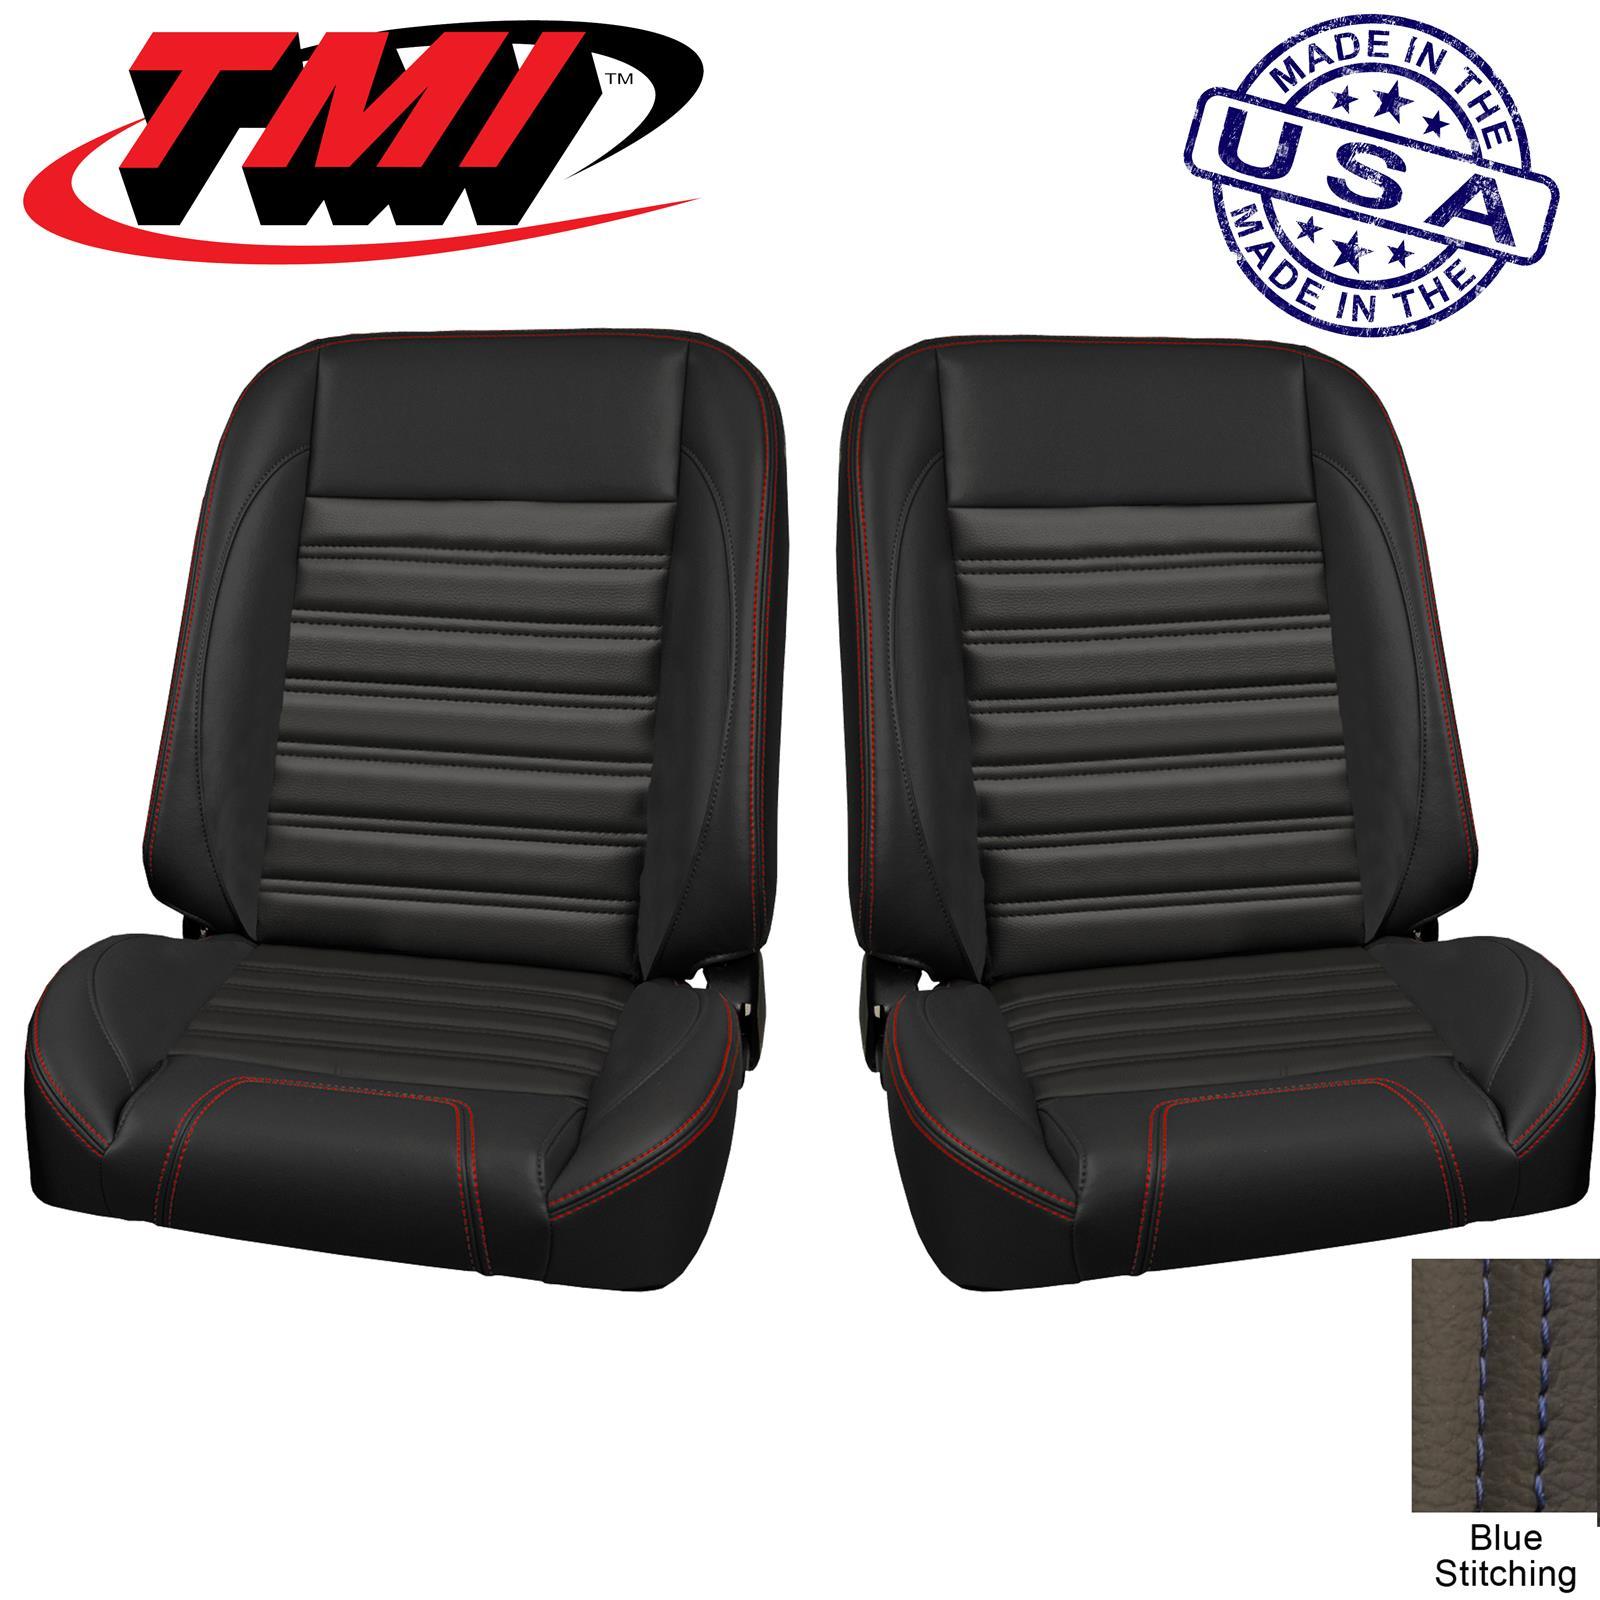 Tmi Pro Classic Sport Series Bucket Seats 47 9700 6525 Bs